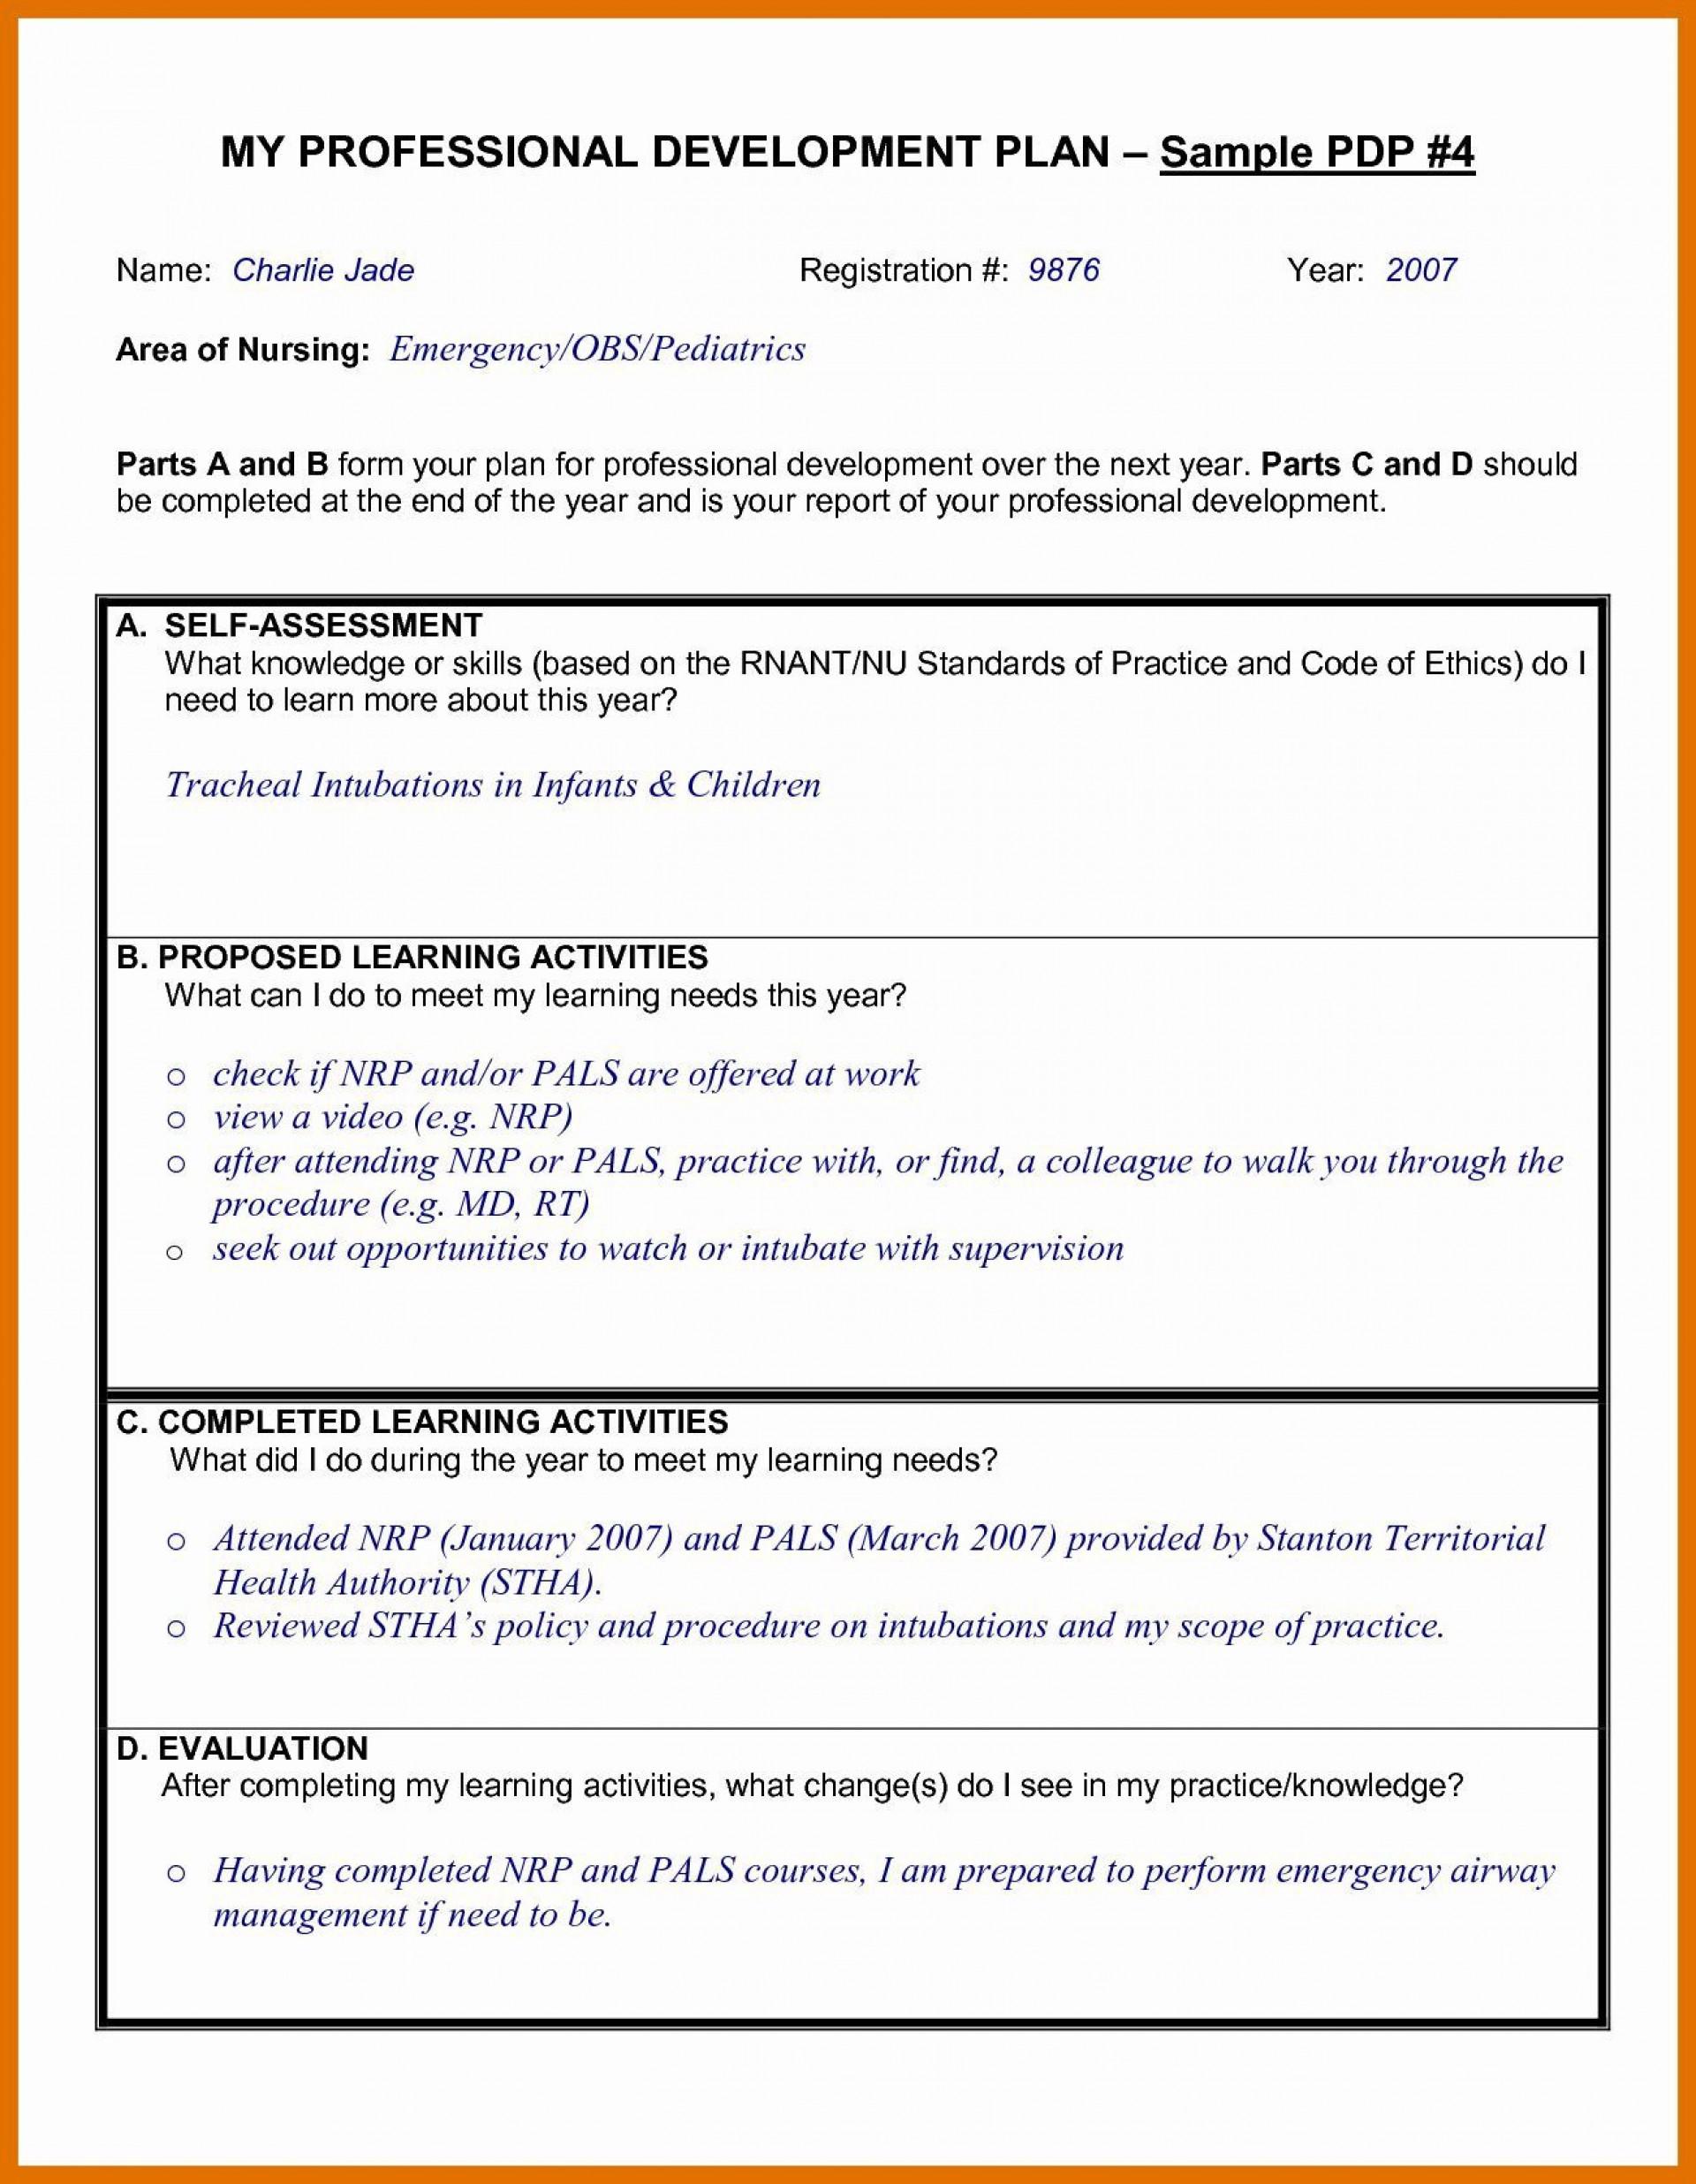 005 Fantastic Professional Development Plan Template For Nurse Example  Nurses Sample Goal1920